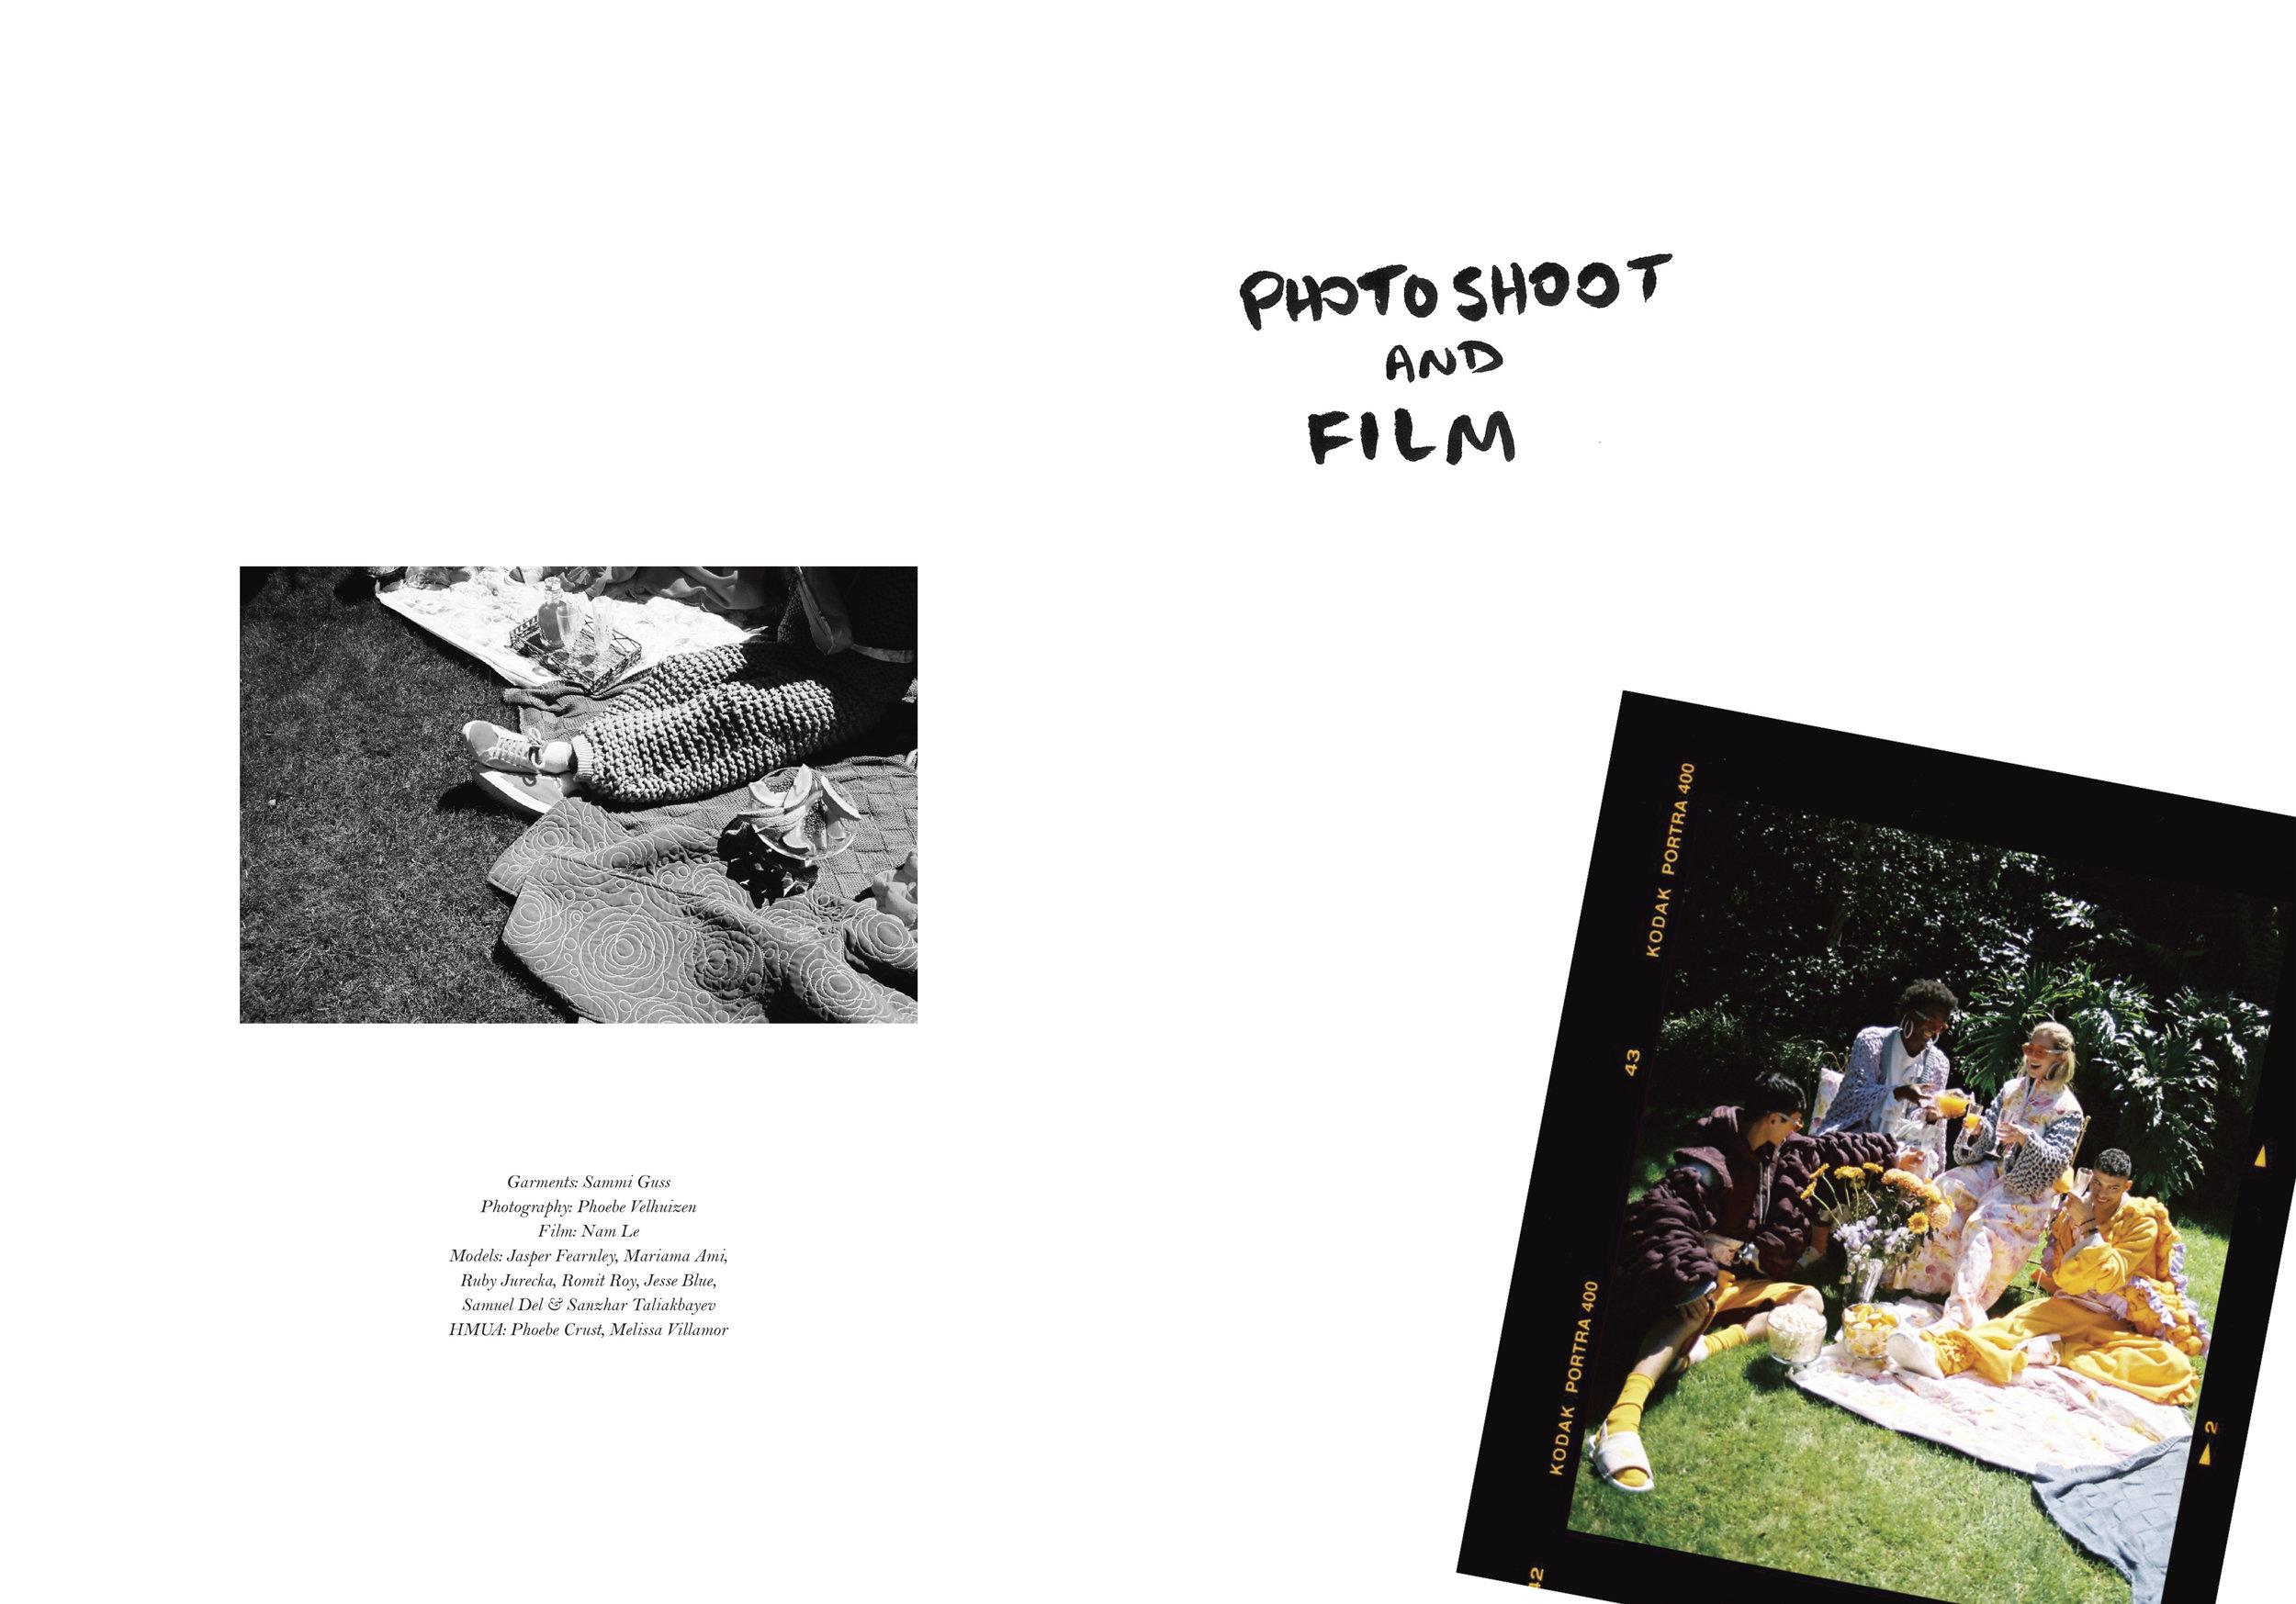 fol79.jpg